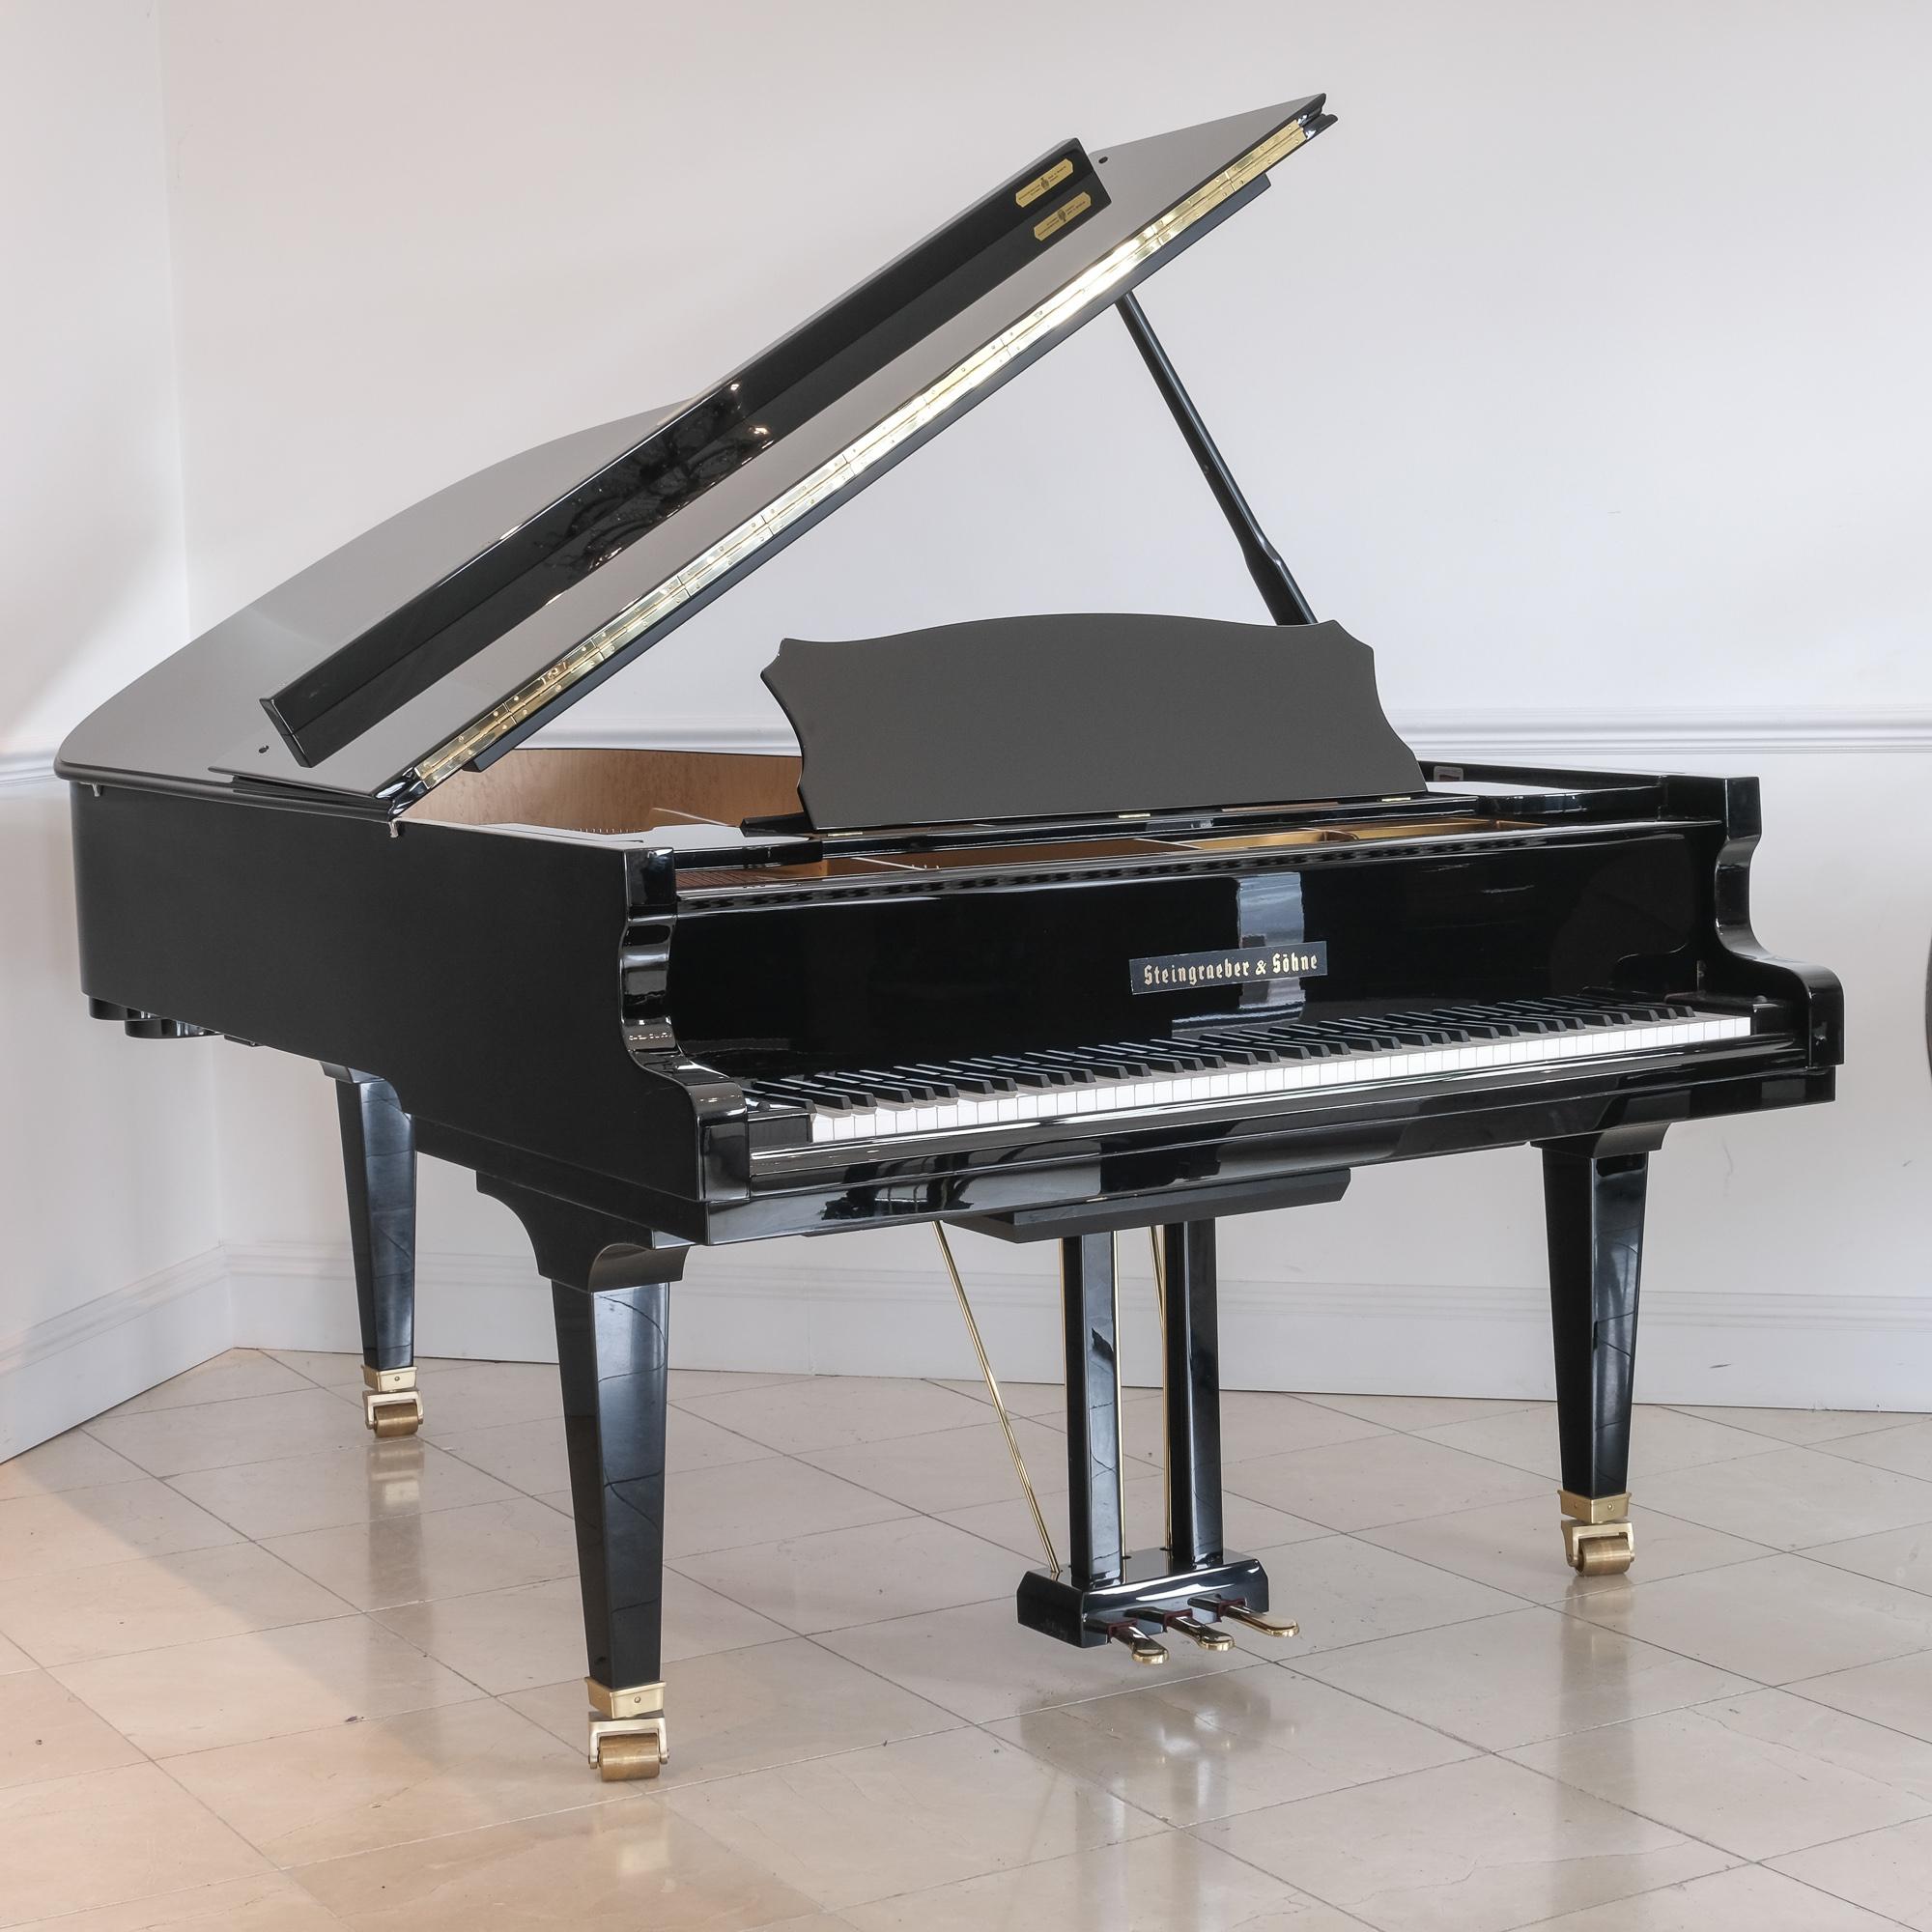 Steingraber C212 grand piano